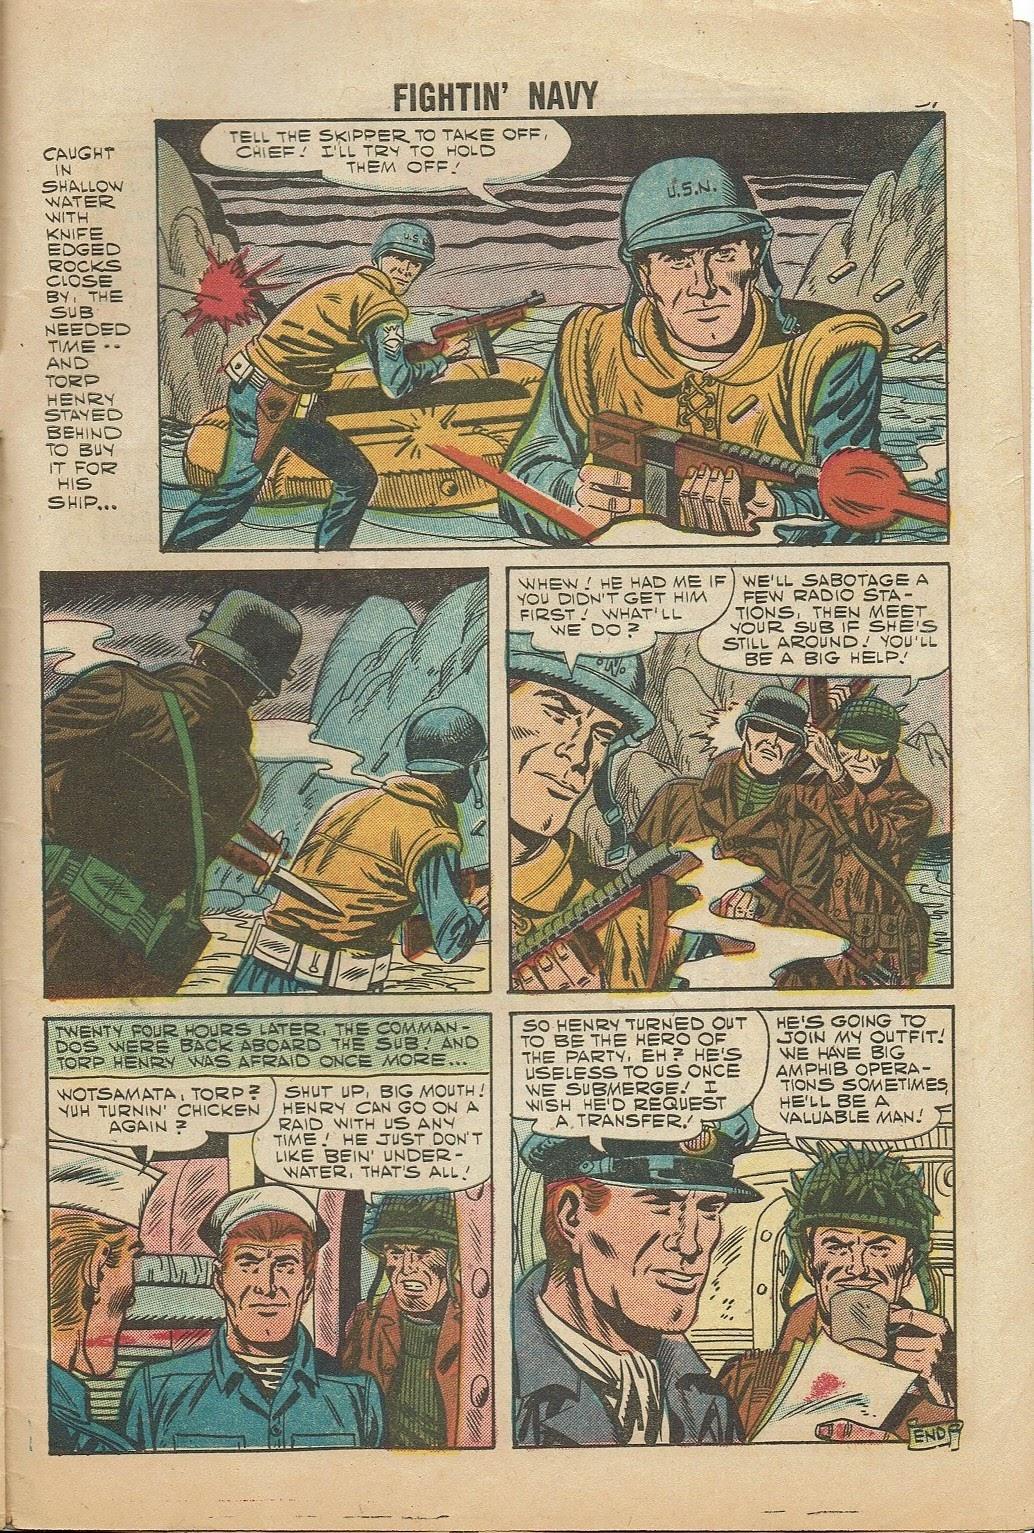 Read online Fightin' Navy comic -  Issue #81 - 33